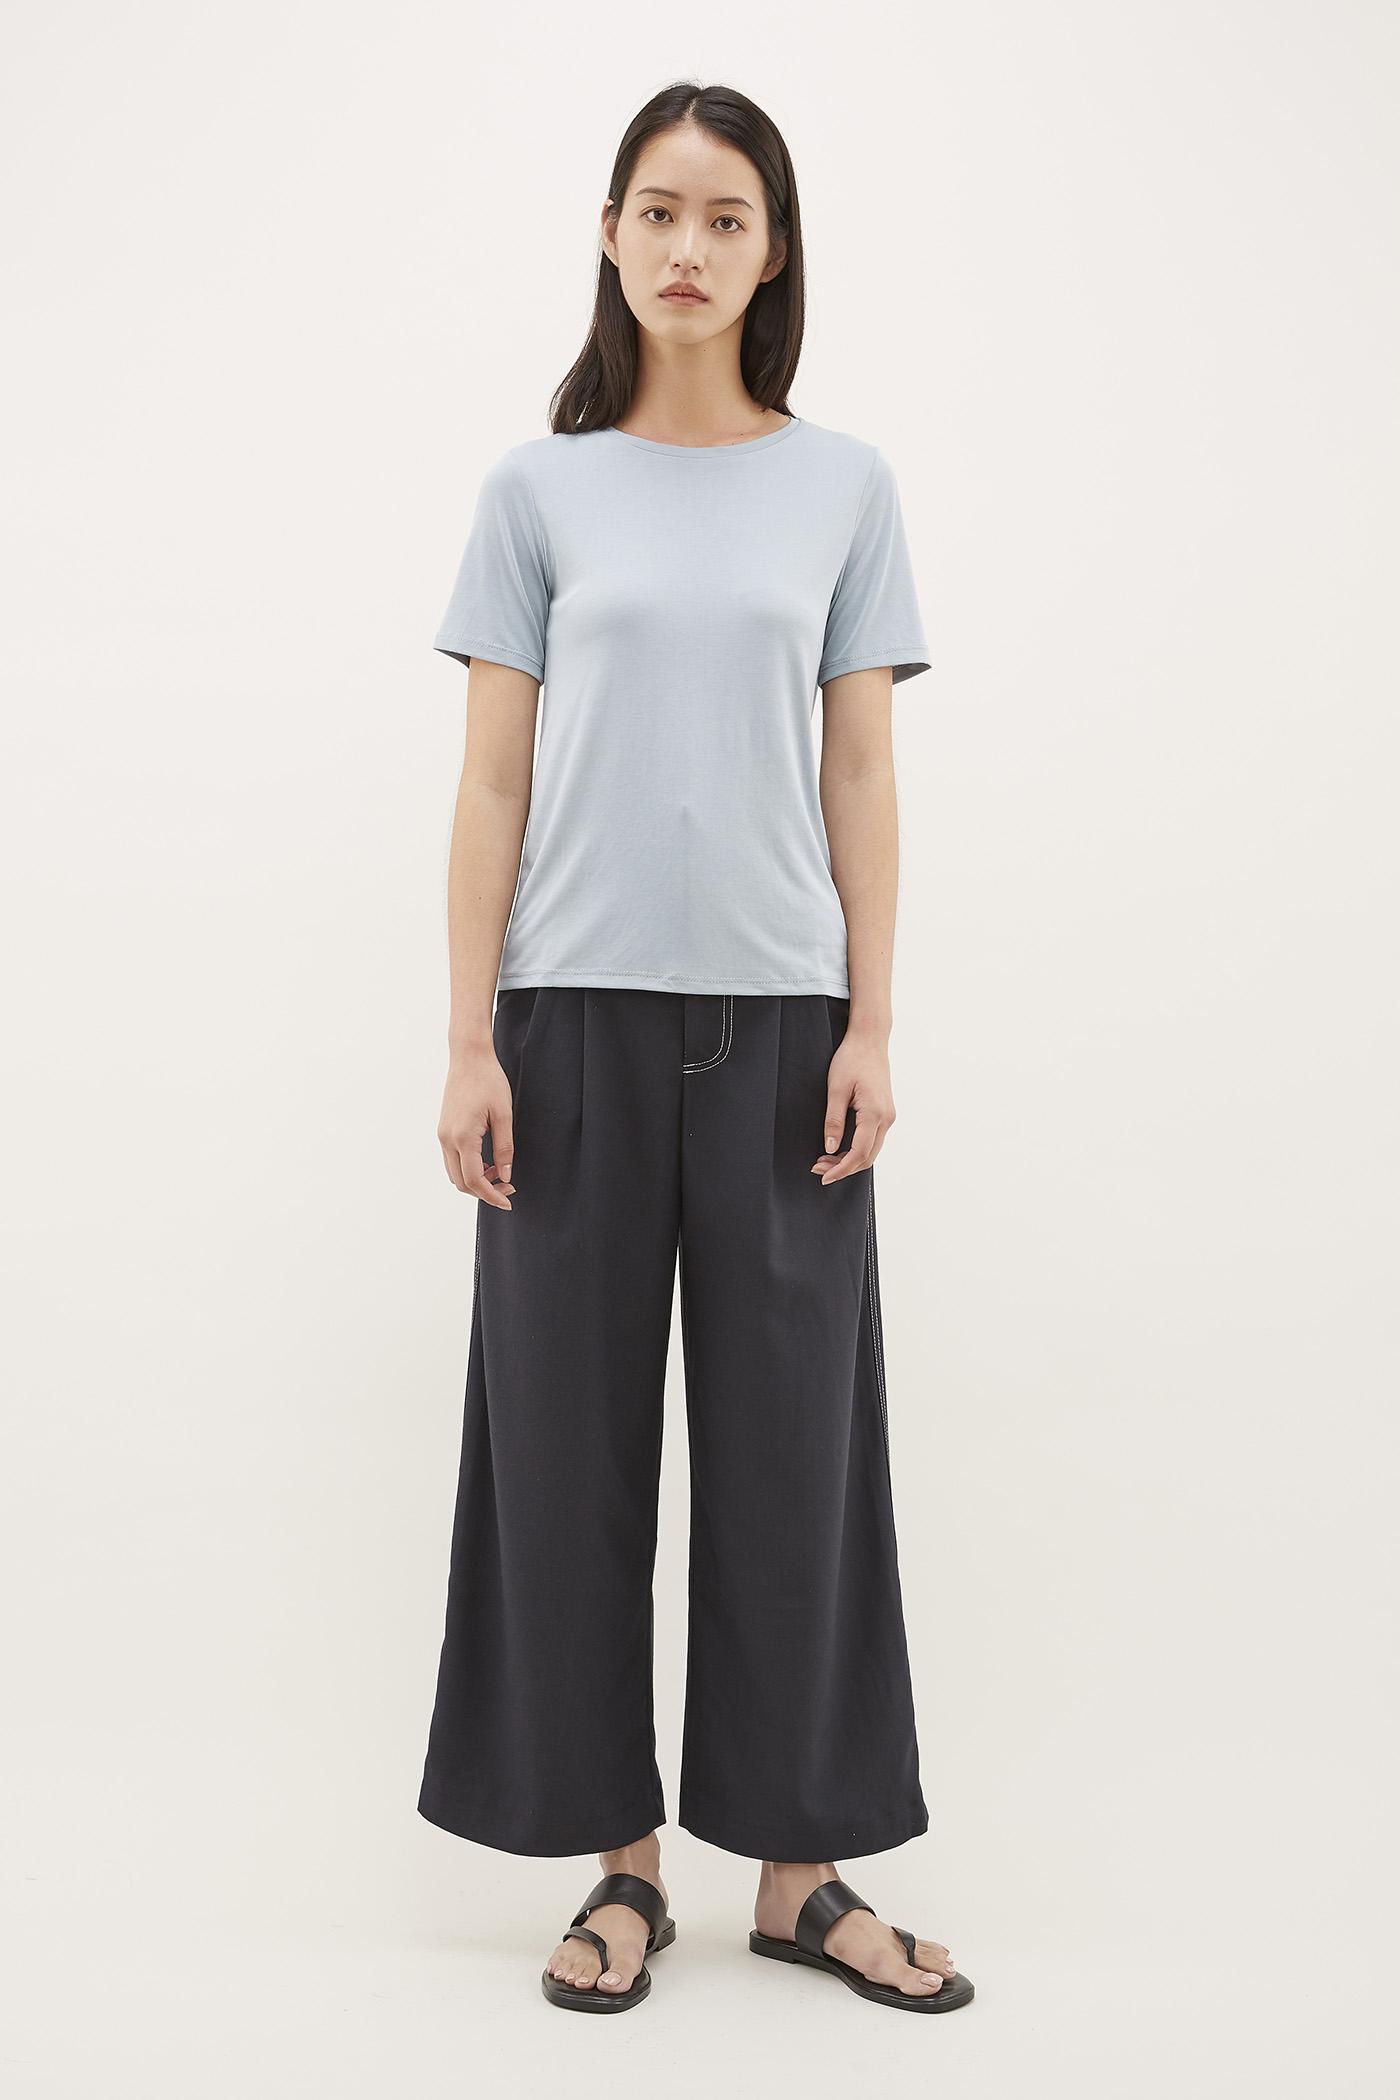 Raysha Top-Stitch Trousers